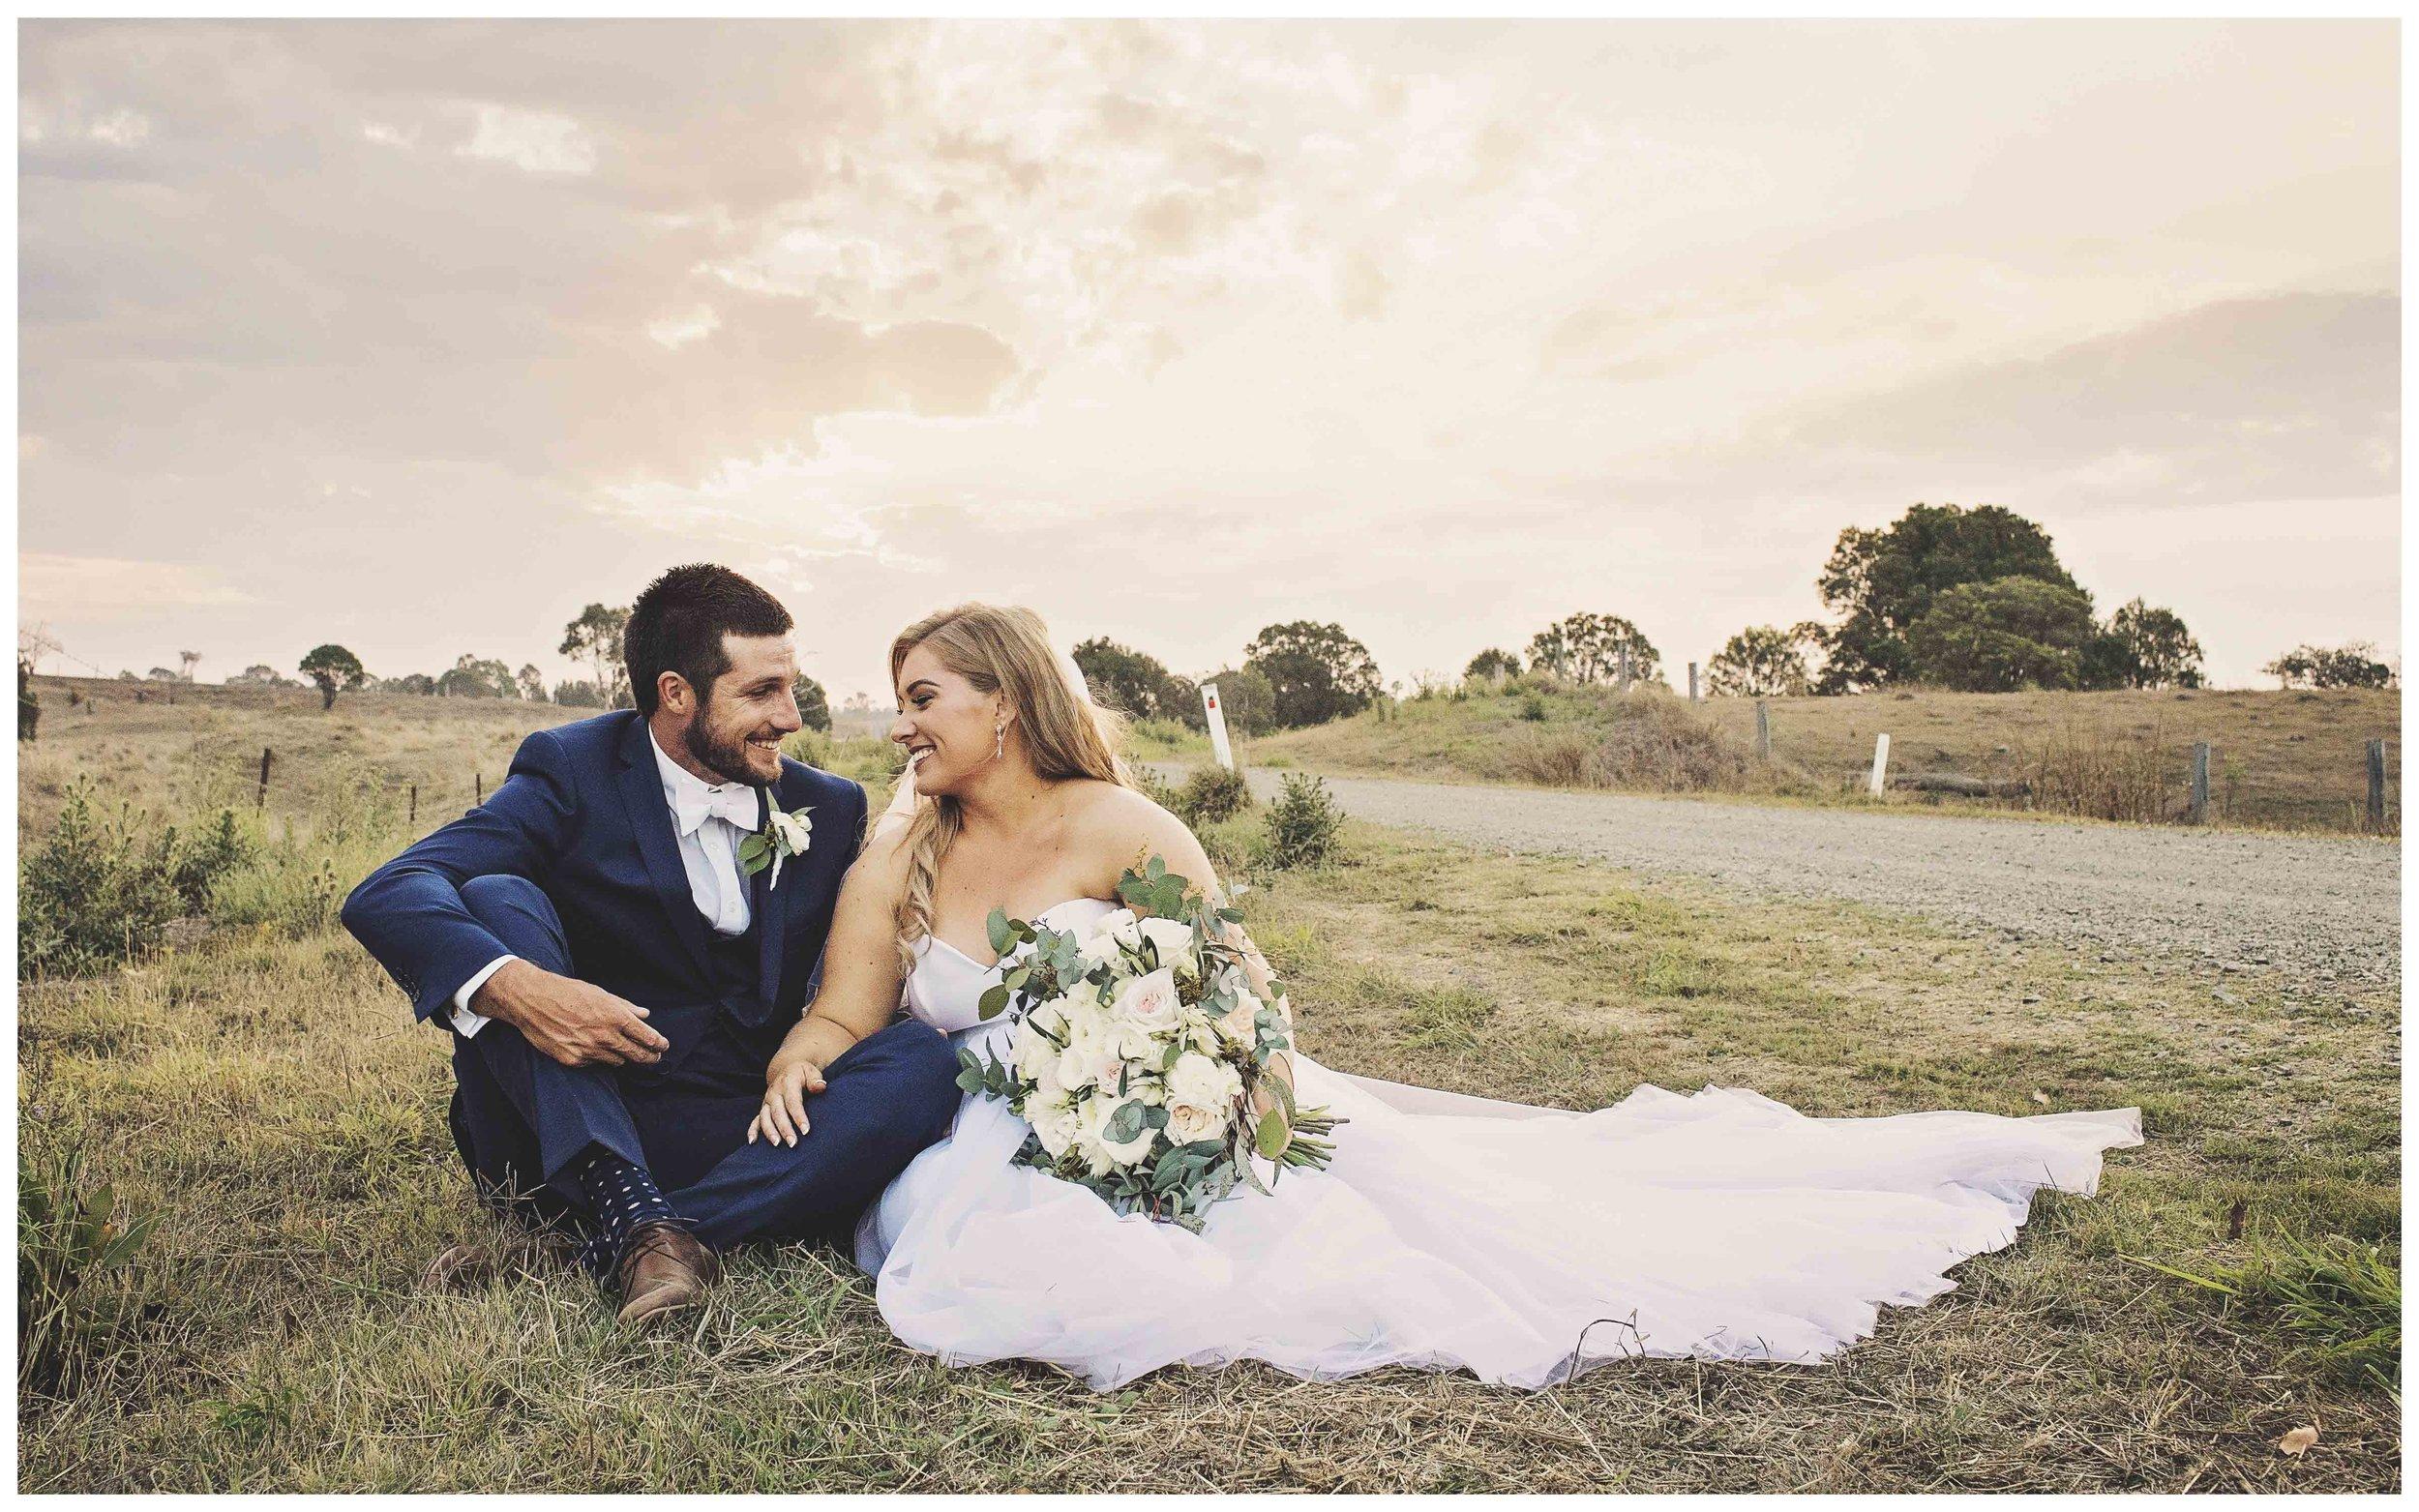 Destination wedding photography Bundaberg 7.jpg